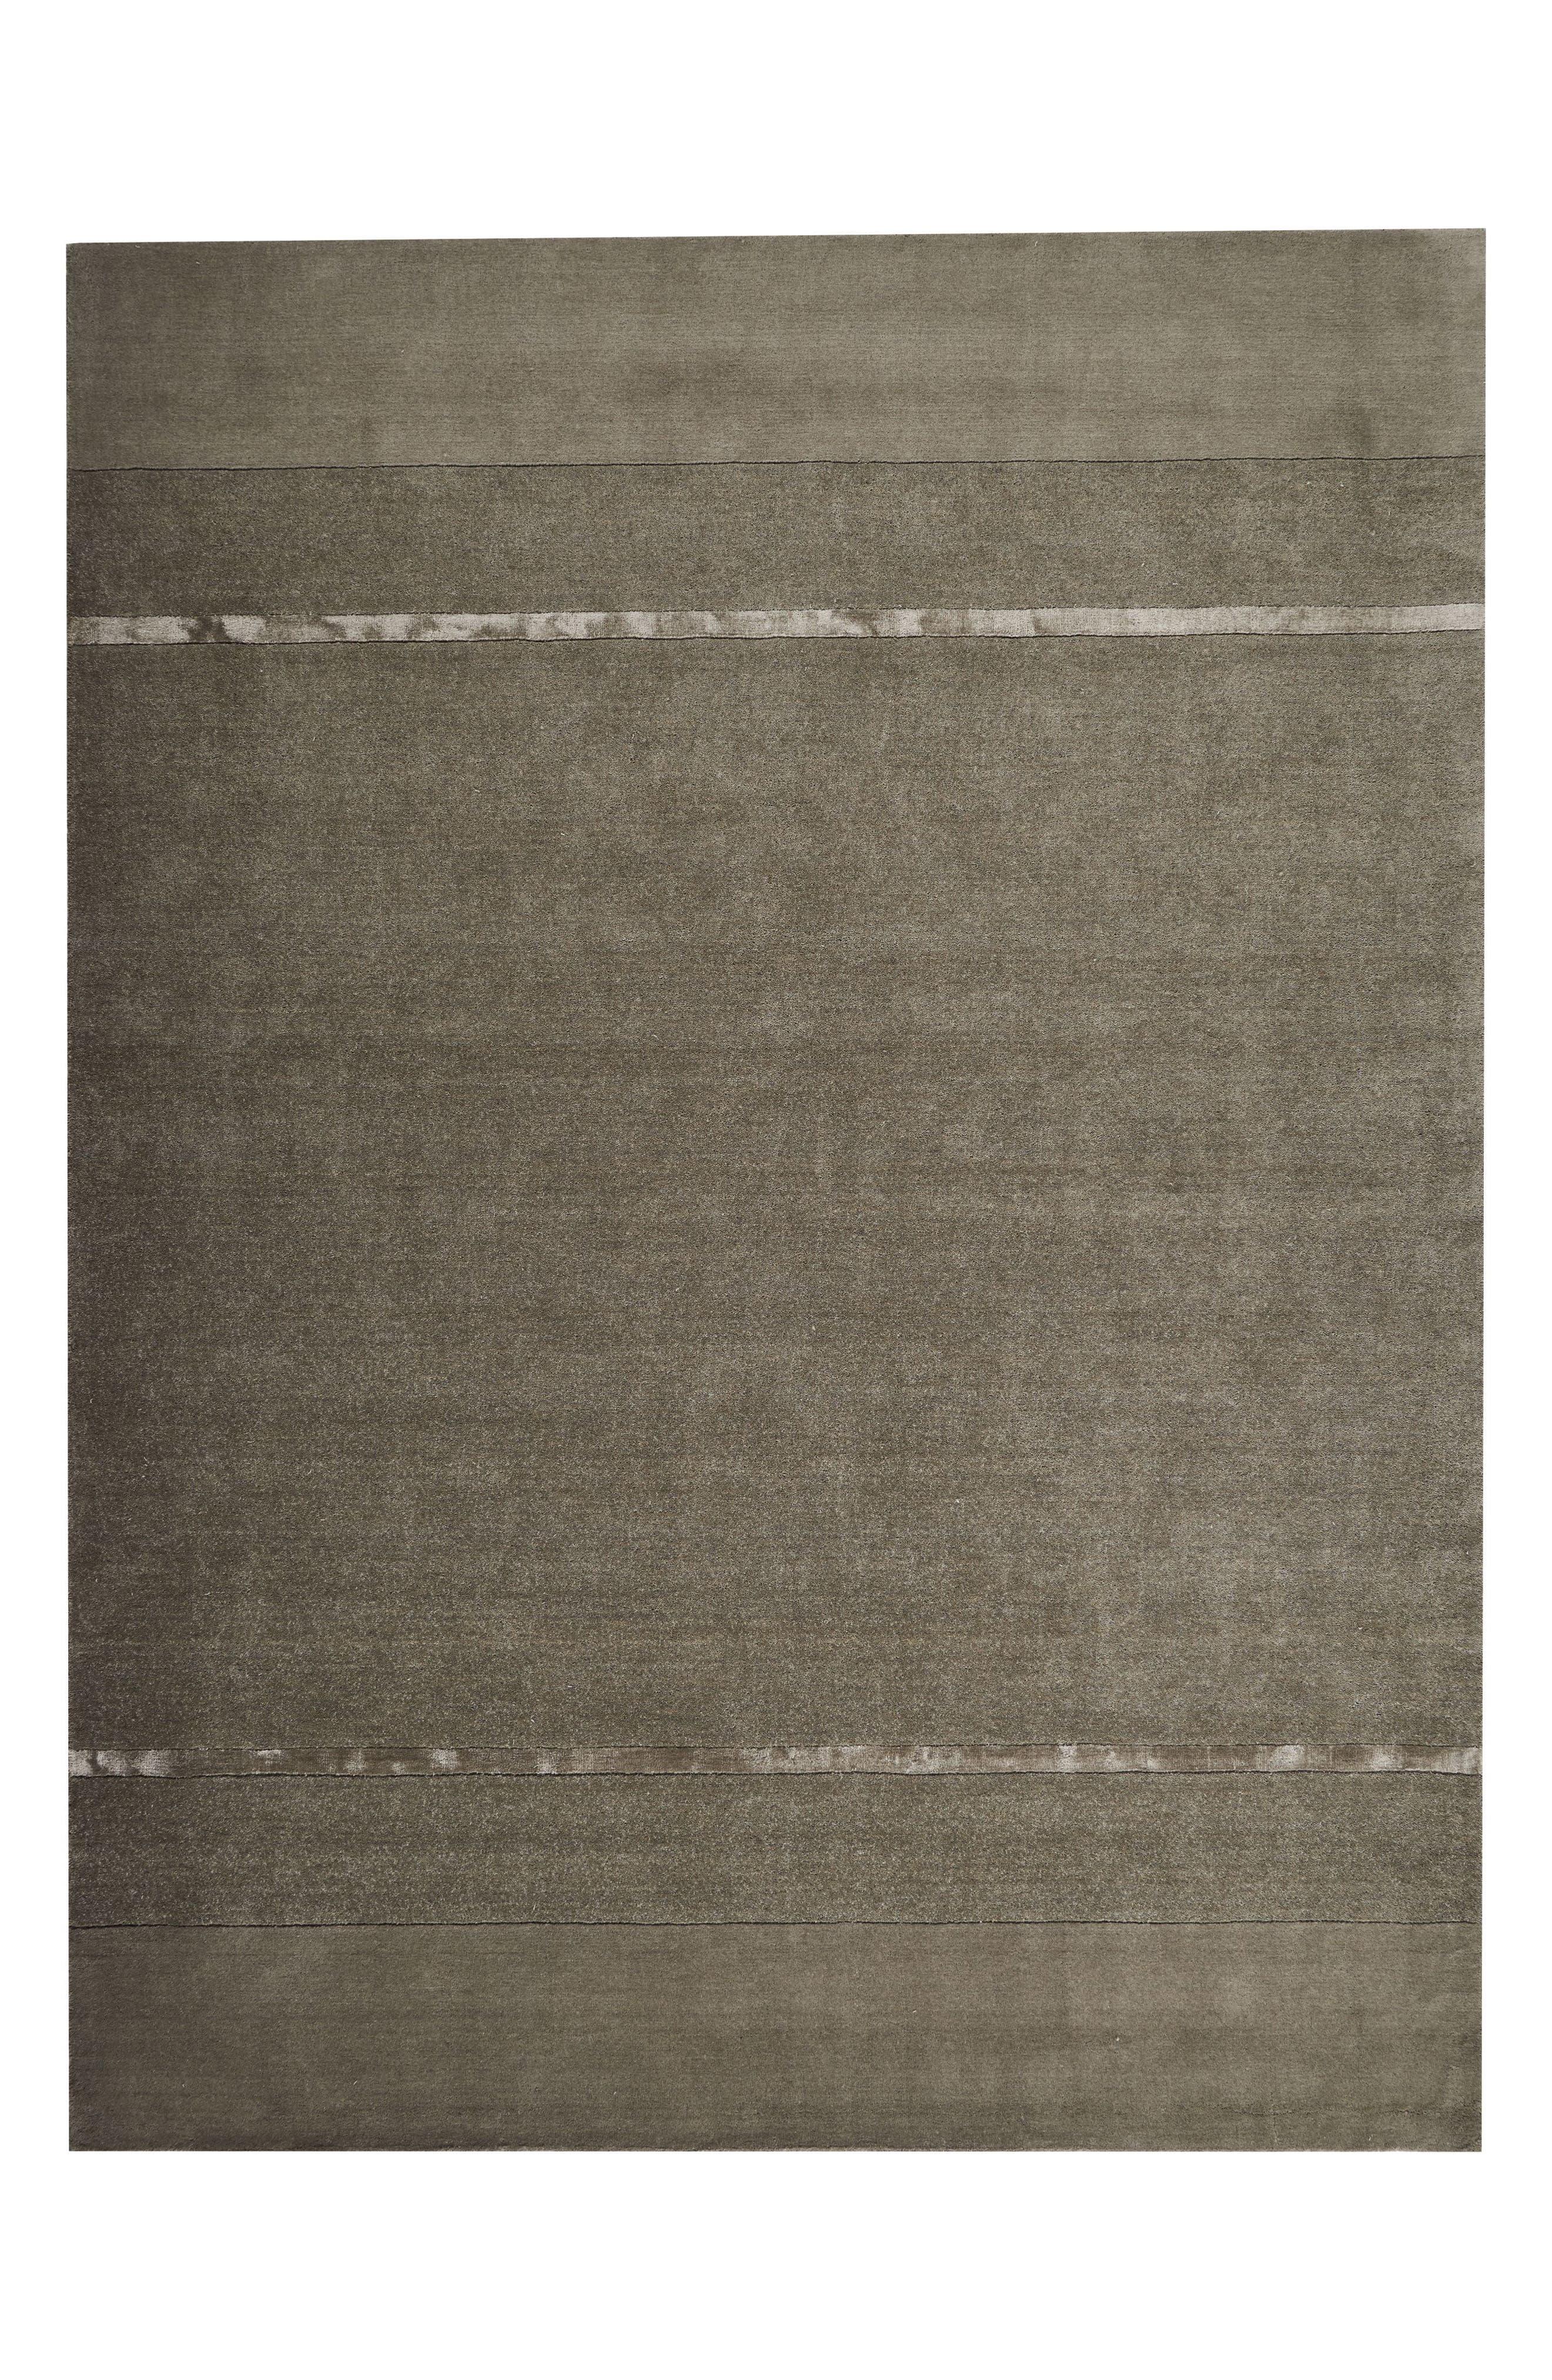 Alternate Image 1 Selected - Calvin Klein Vale Handwoven Area Rug